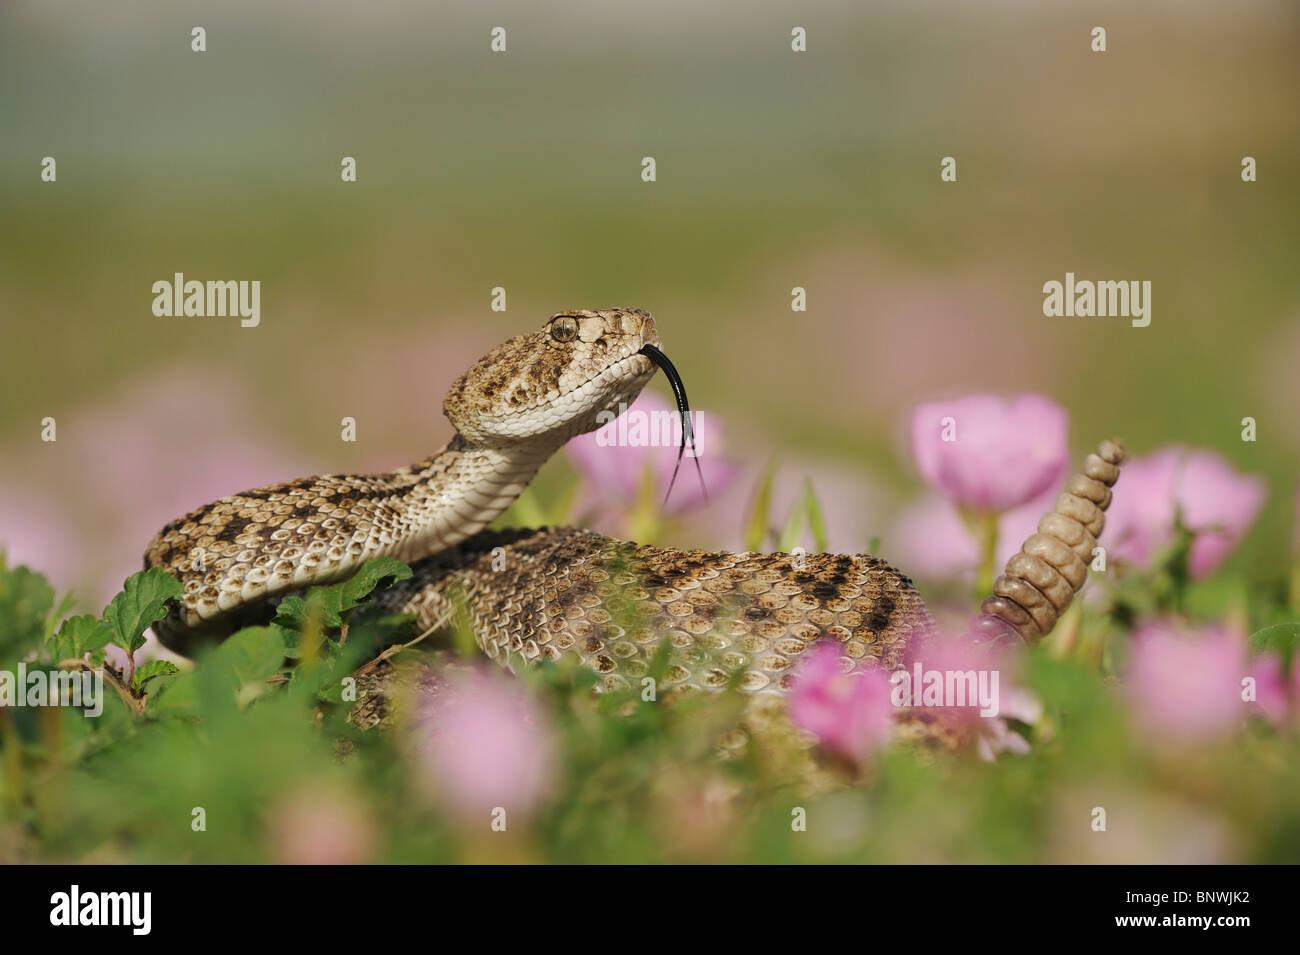 Western Diamondback Rattlesnake (Crotalus atrox), adult in striking pose in field of Showy Primrose, Coastal Bend, - Stock Image